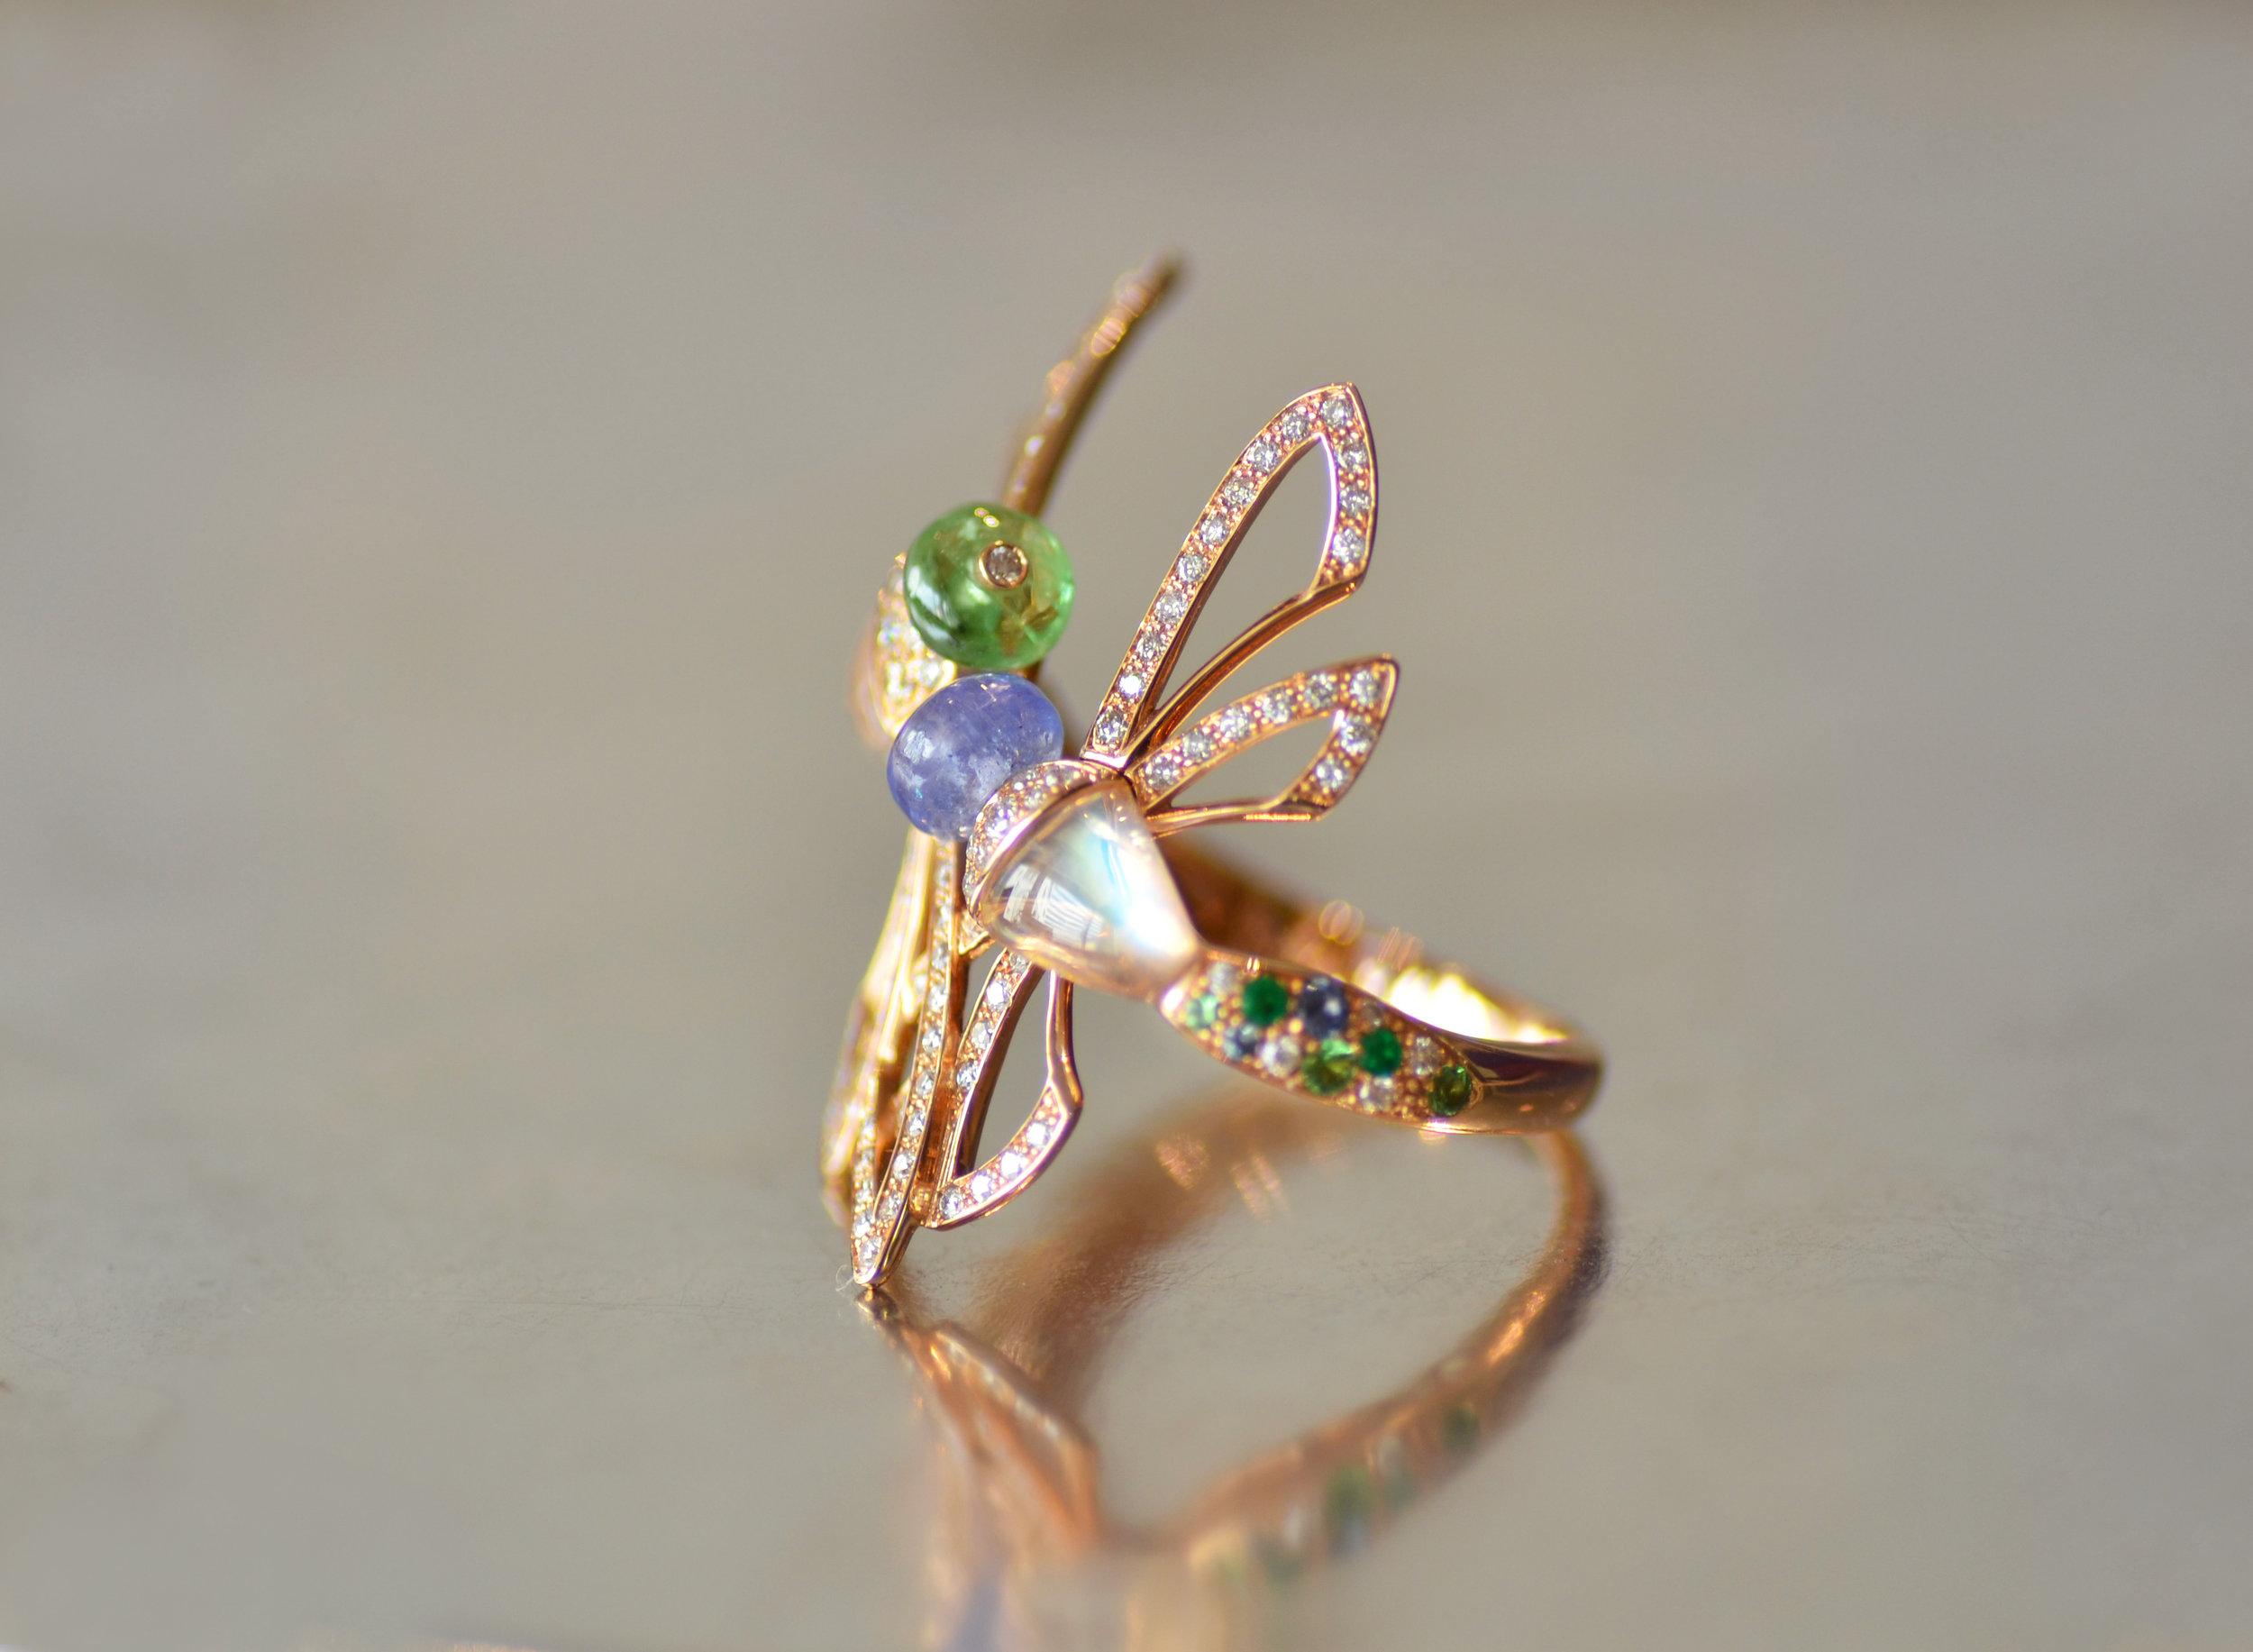 Rubicon Jewelry Bangkok Thailand Dragonfly ring tanzanite tsavorite rainbow moonstonde diamond